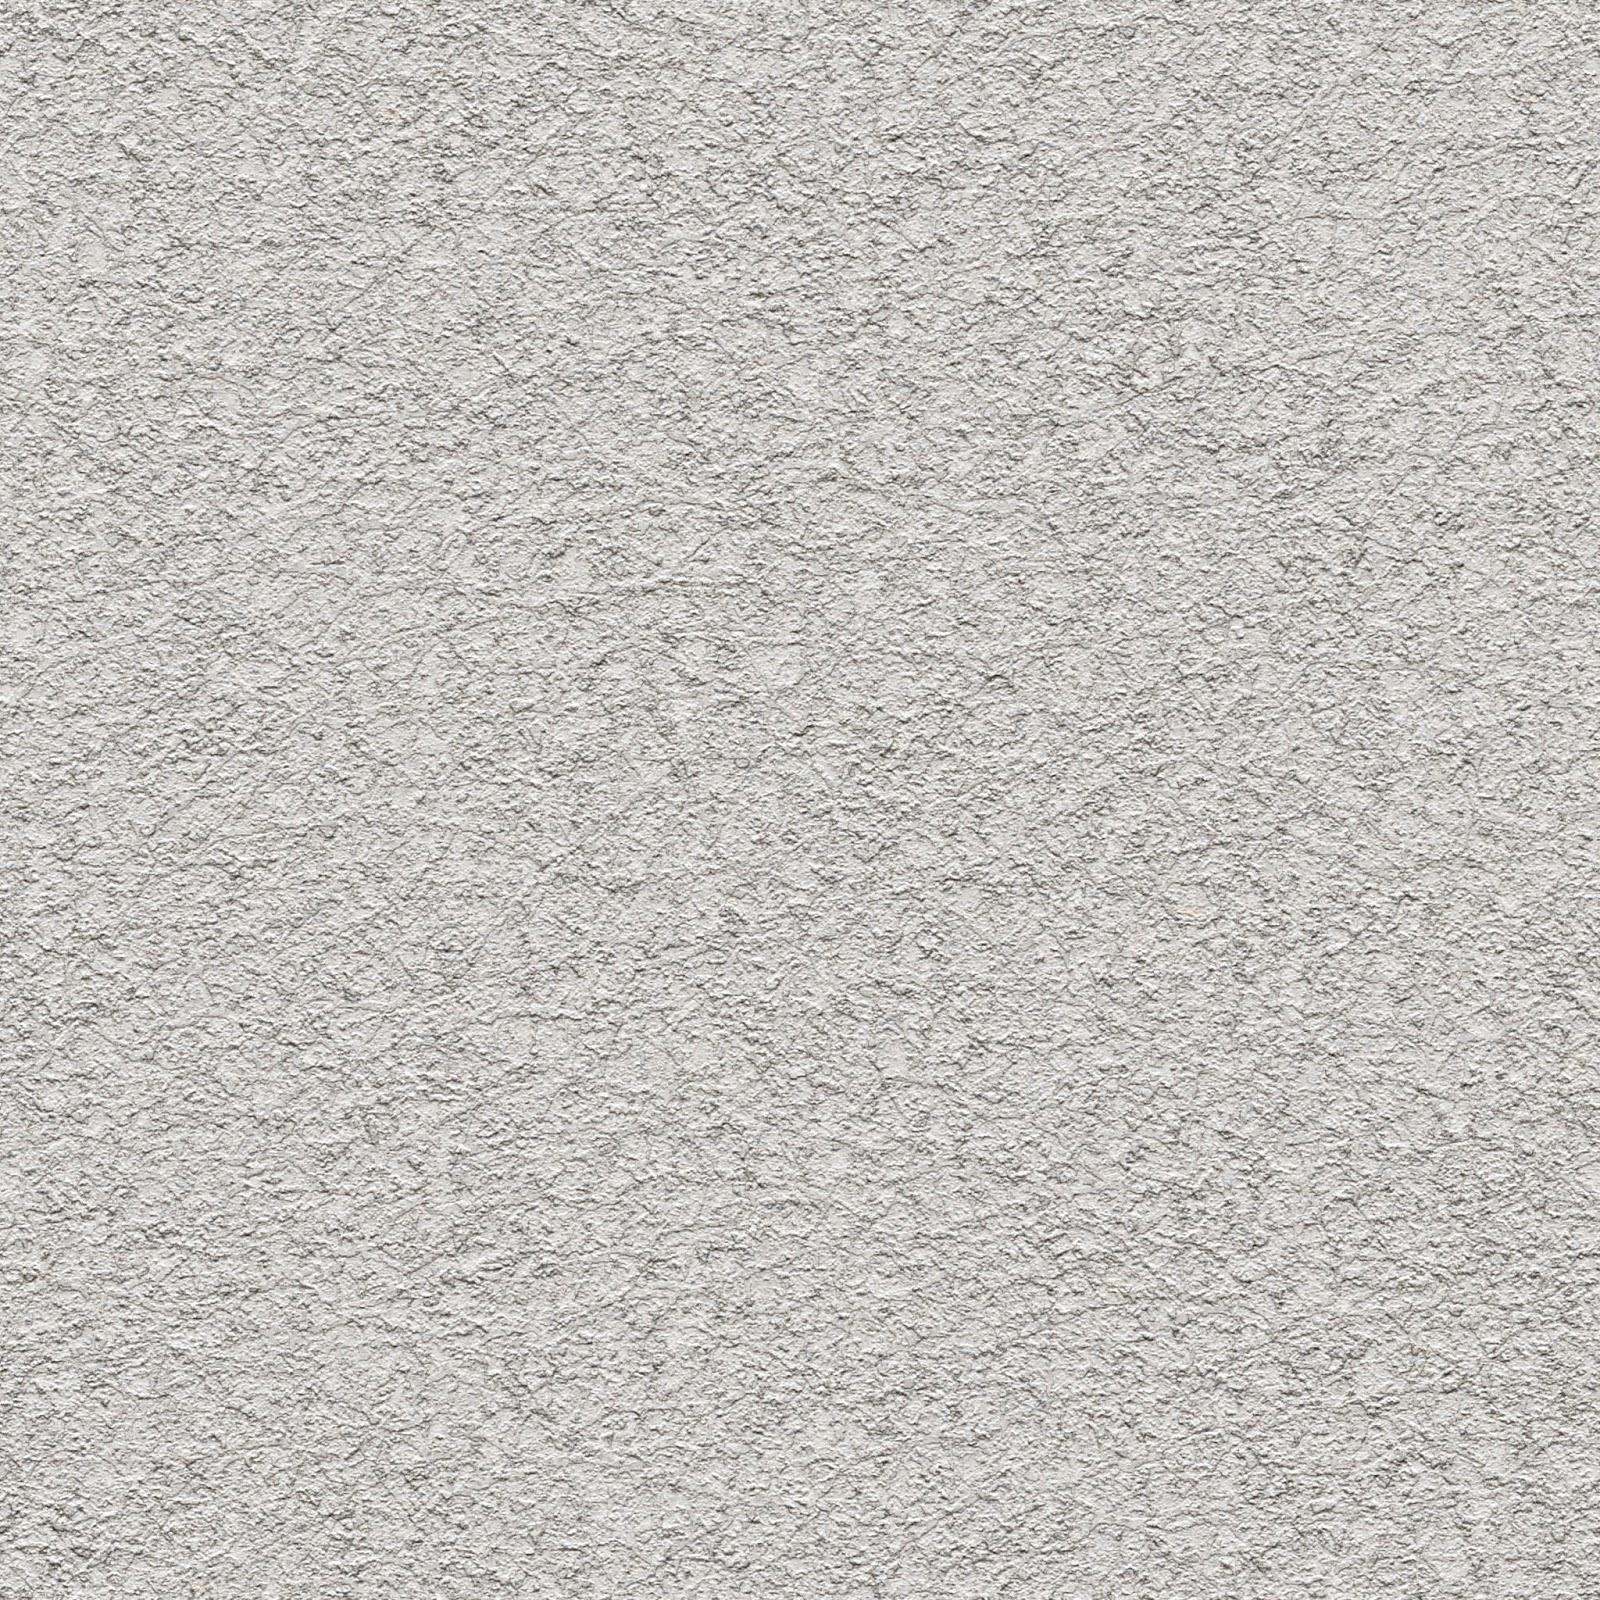 High Resolution Seamless Textures April